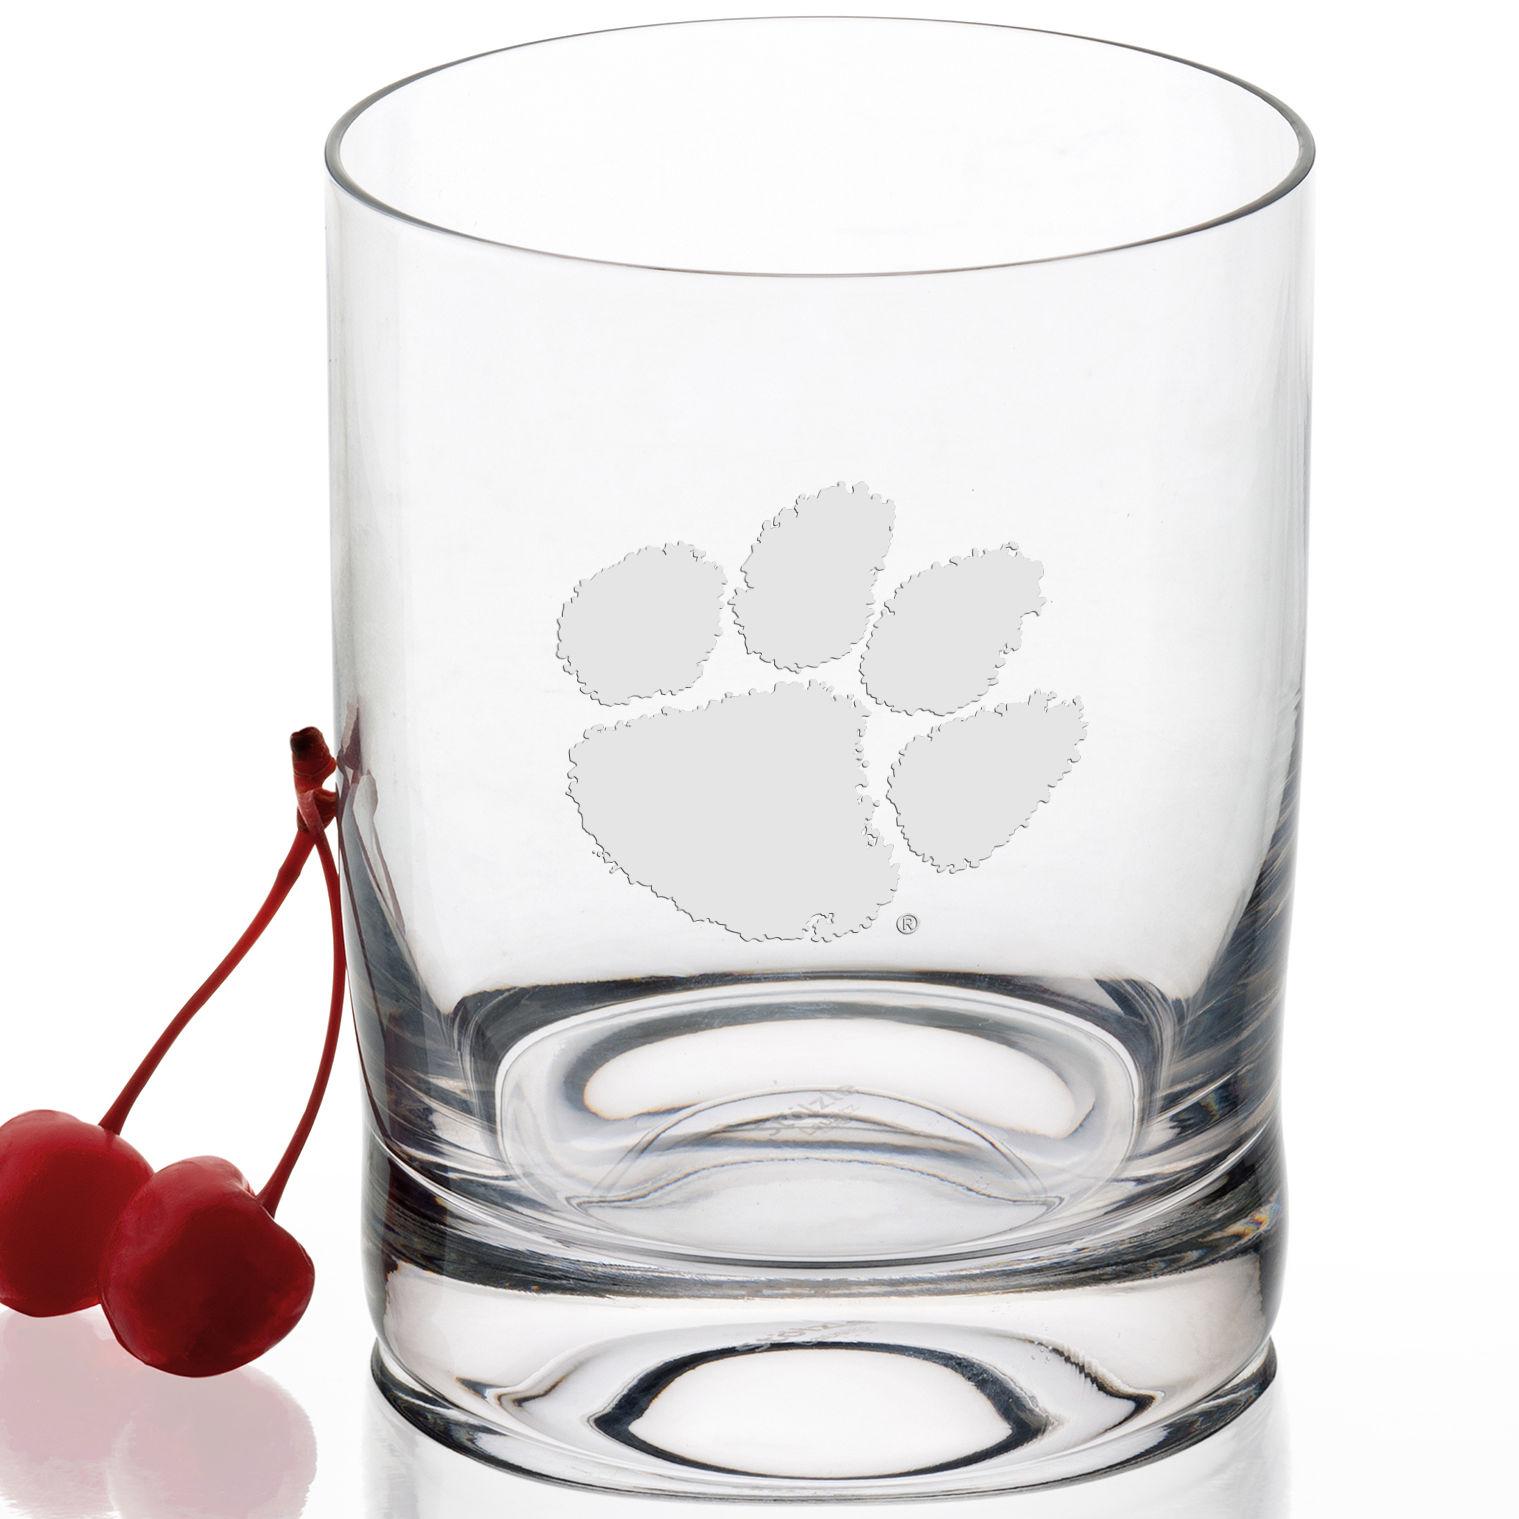 Clemson Tumbler Glasses - Set of 4 - Image 2